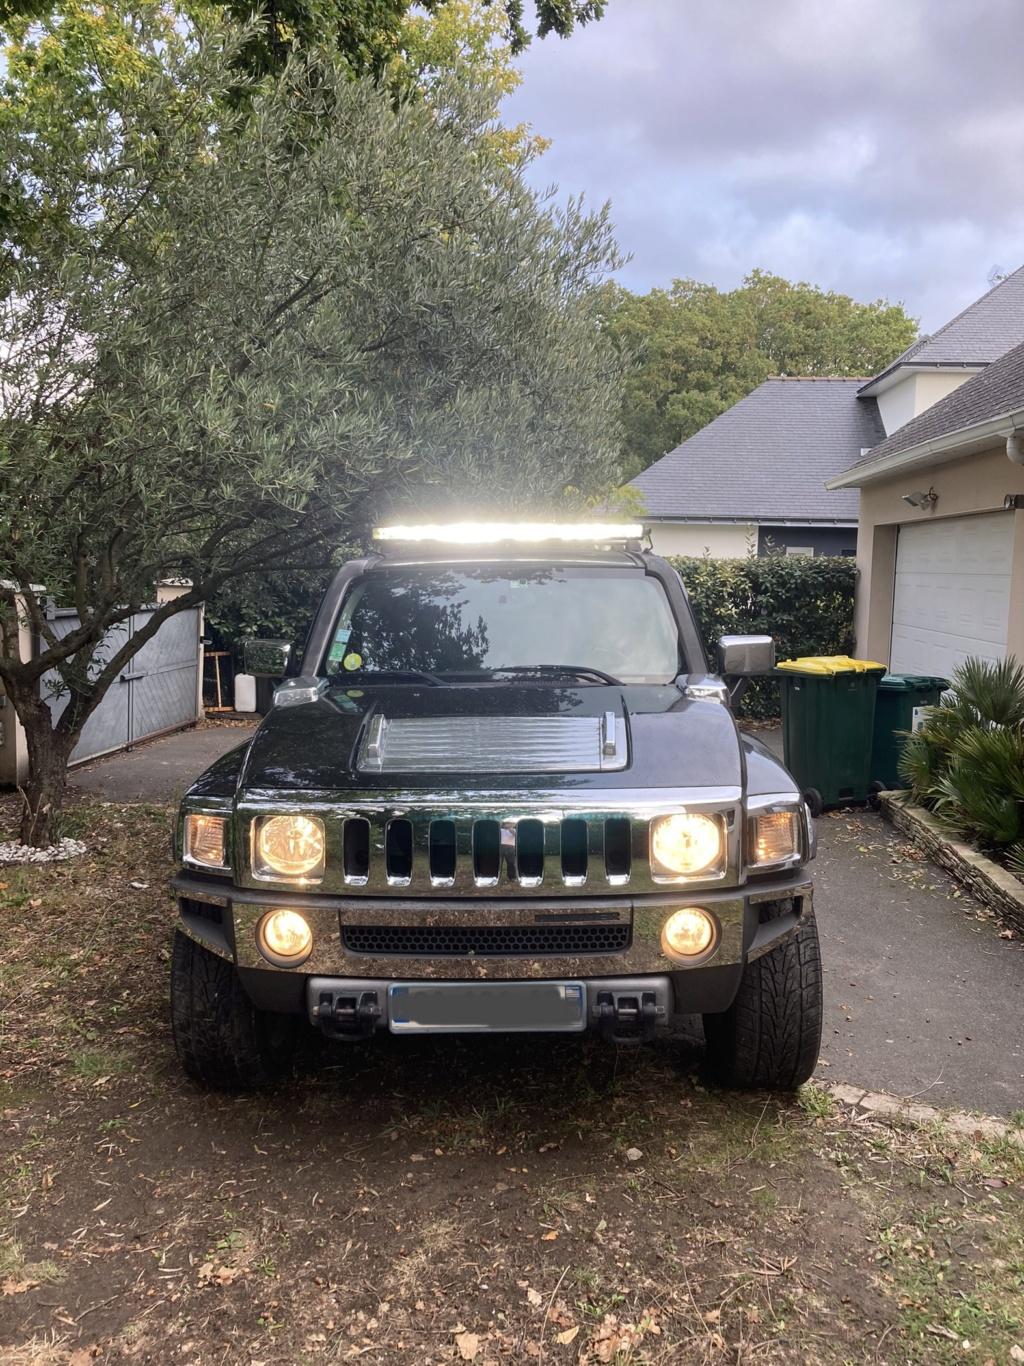 A vendre Hummer h3  Ac26aa10